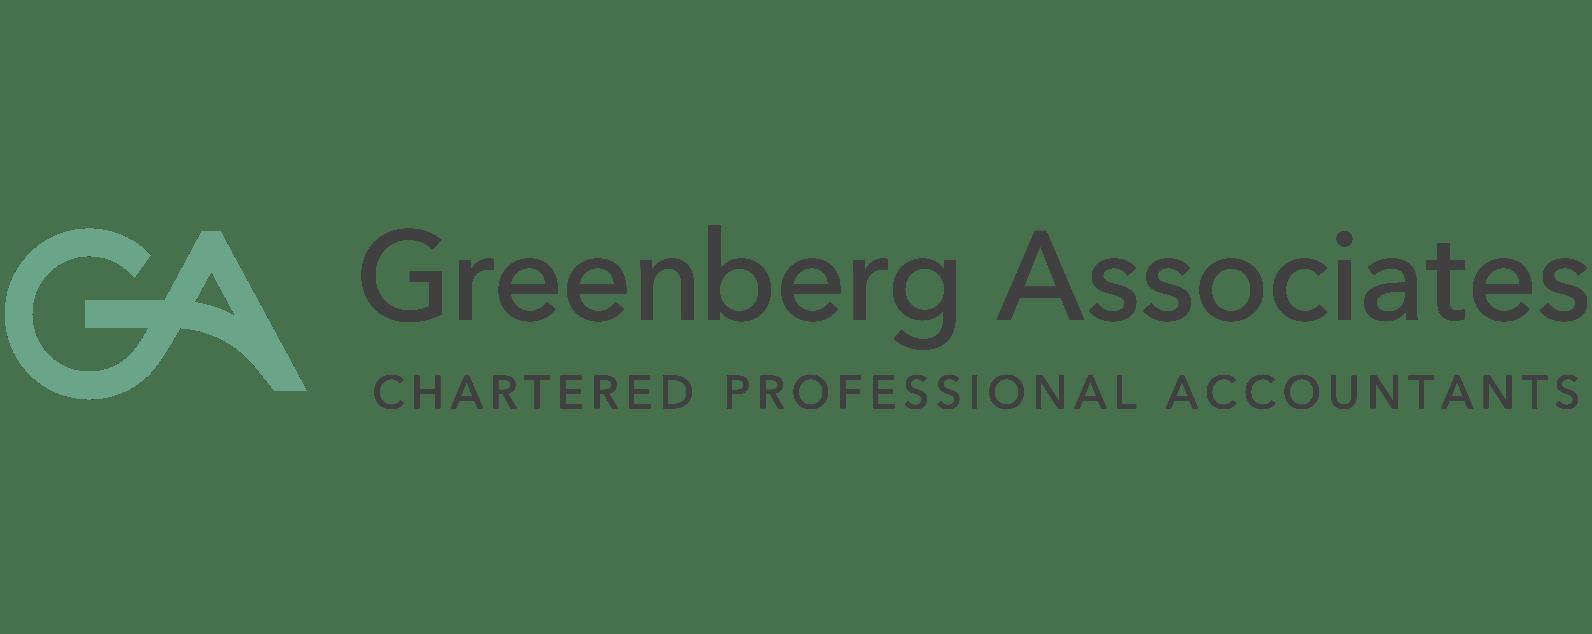 Greenberg Associates [1592x634]